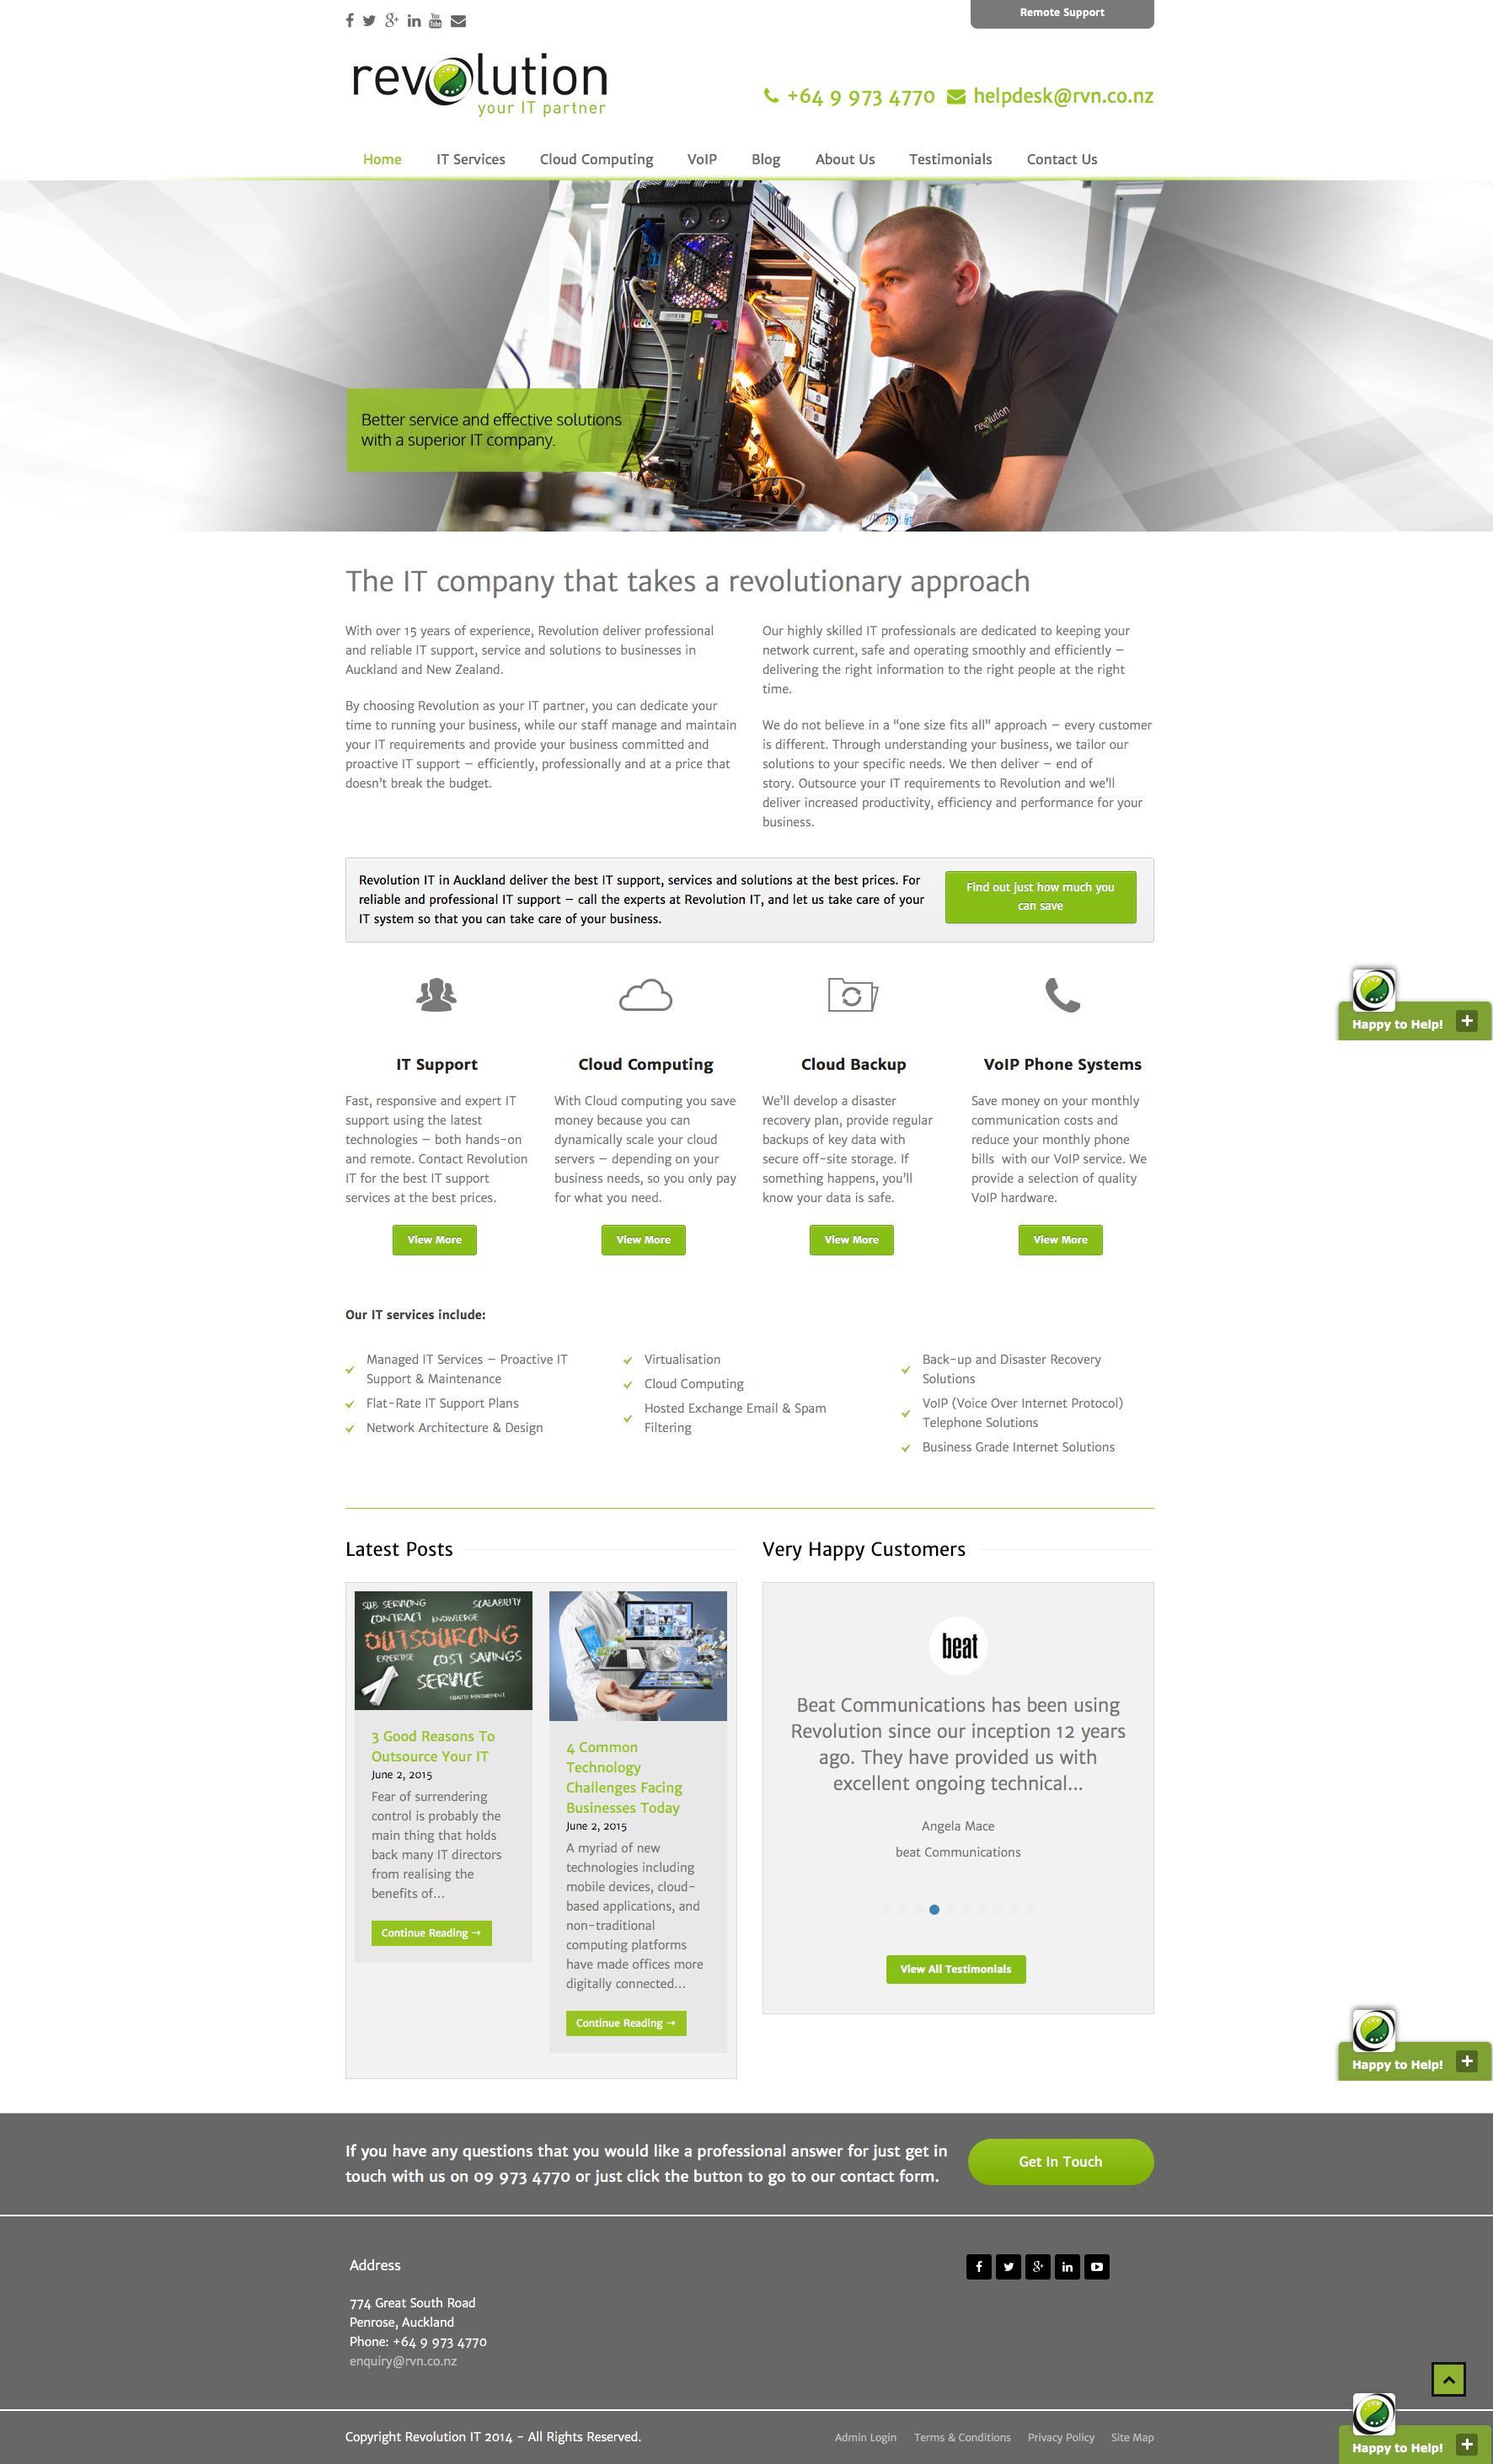 Design Fon An It Company In 2020 Digital Marketing Company Website Design Company Web Development Design